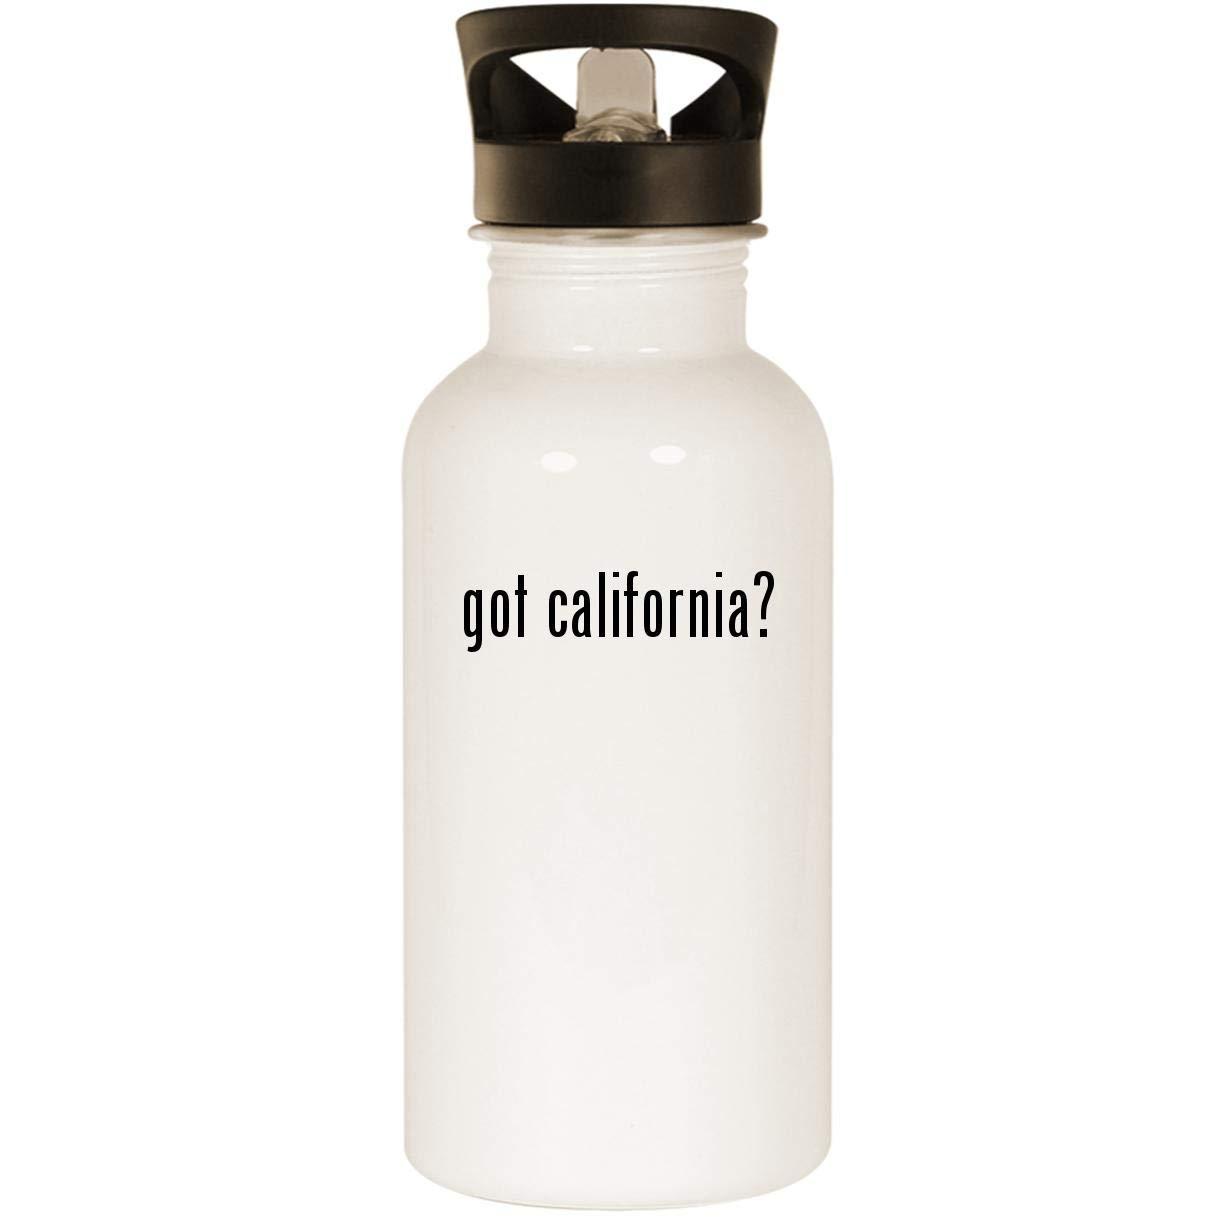 got california? - Stainless Steel 20oz Road Ready Water Bottle, White